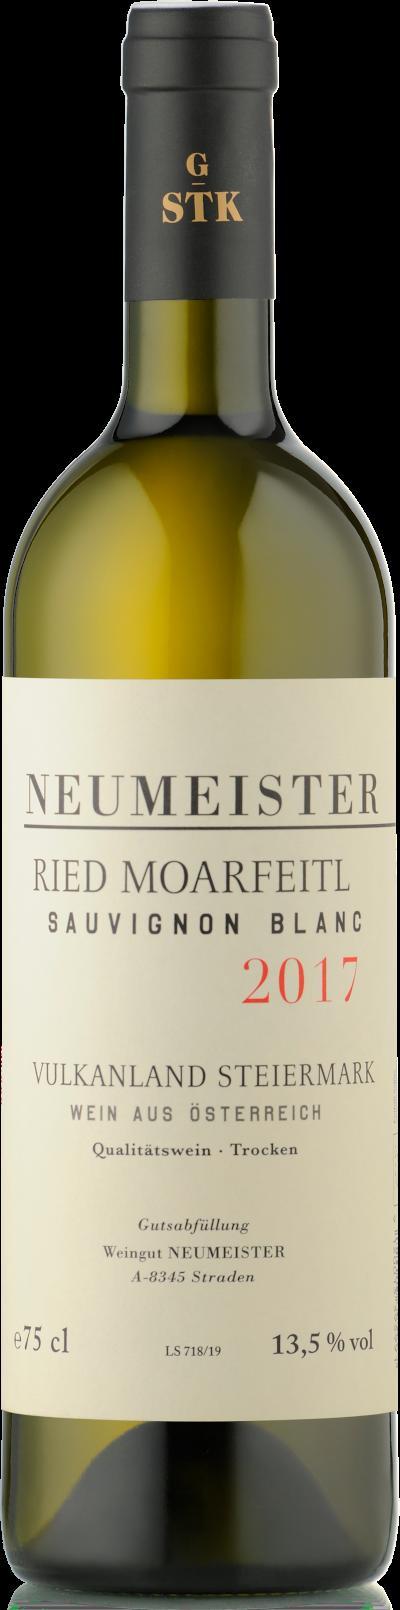 Neumeister - Sauvignon Blanc Ried Moarfeitl bio